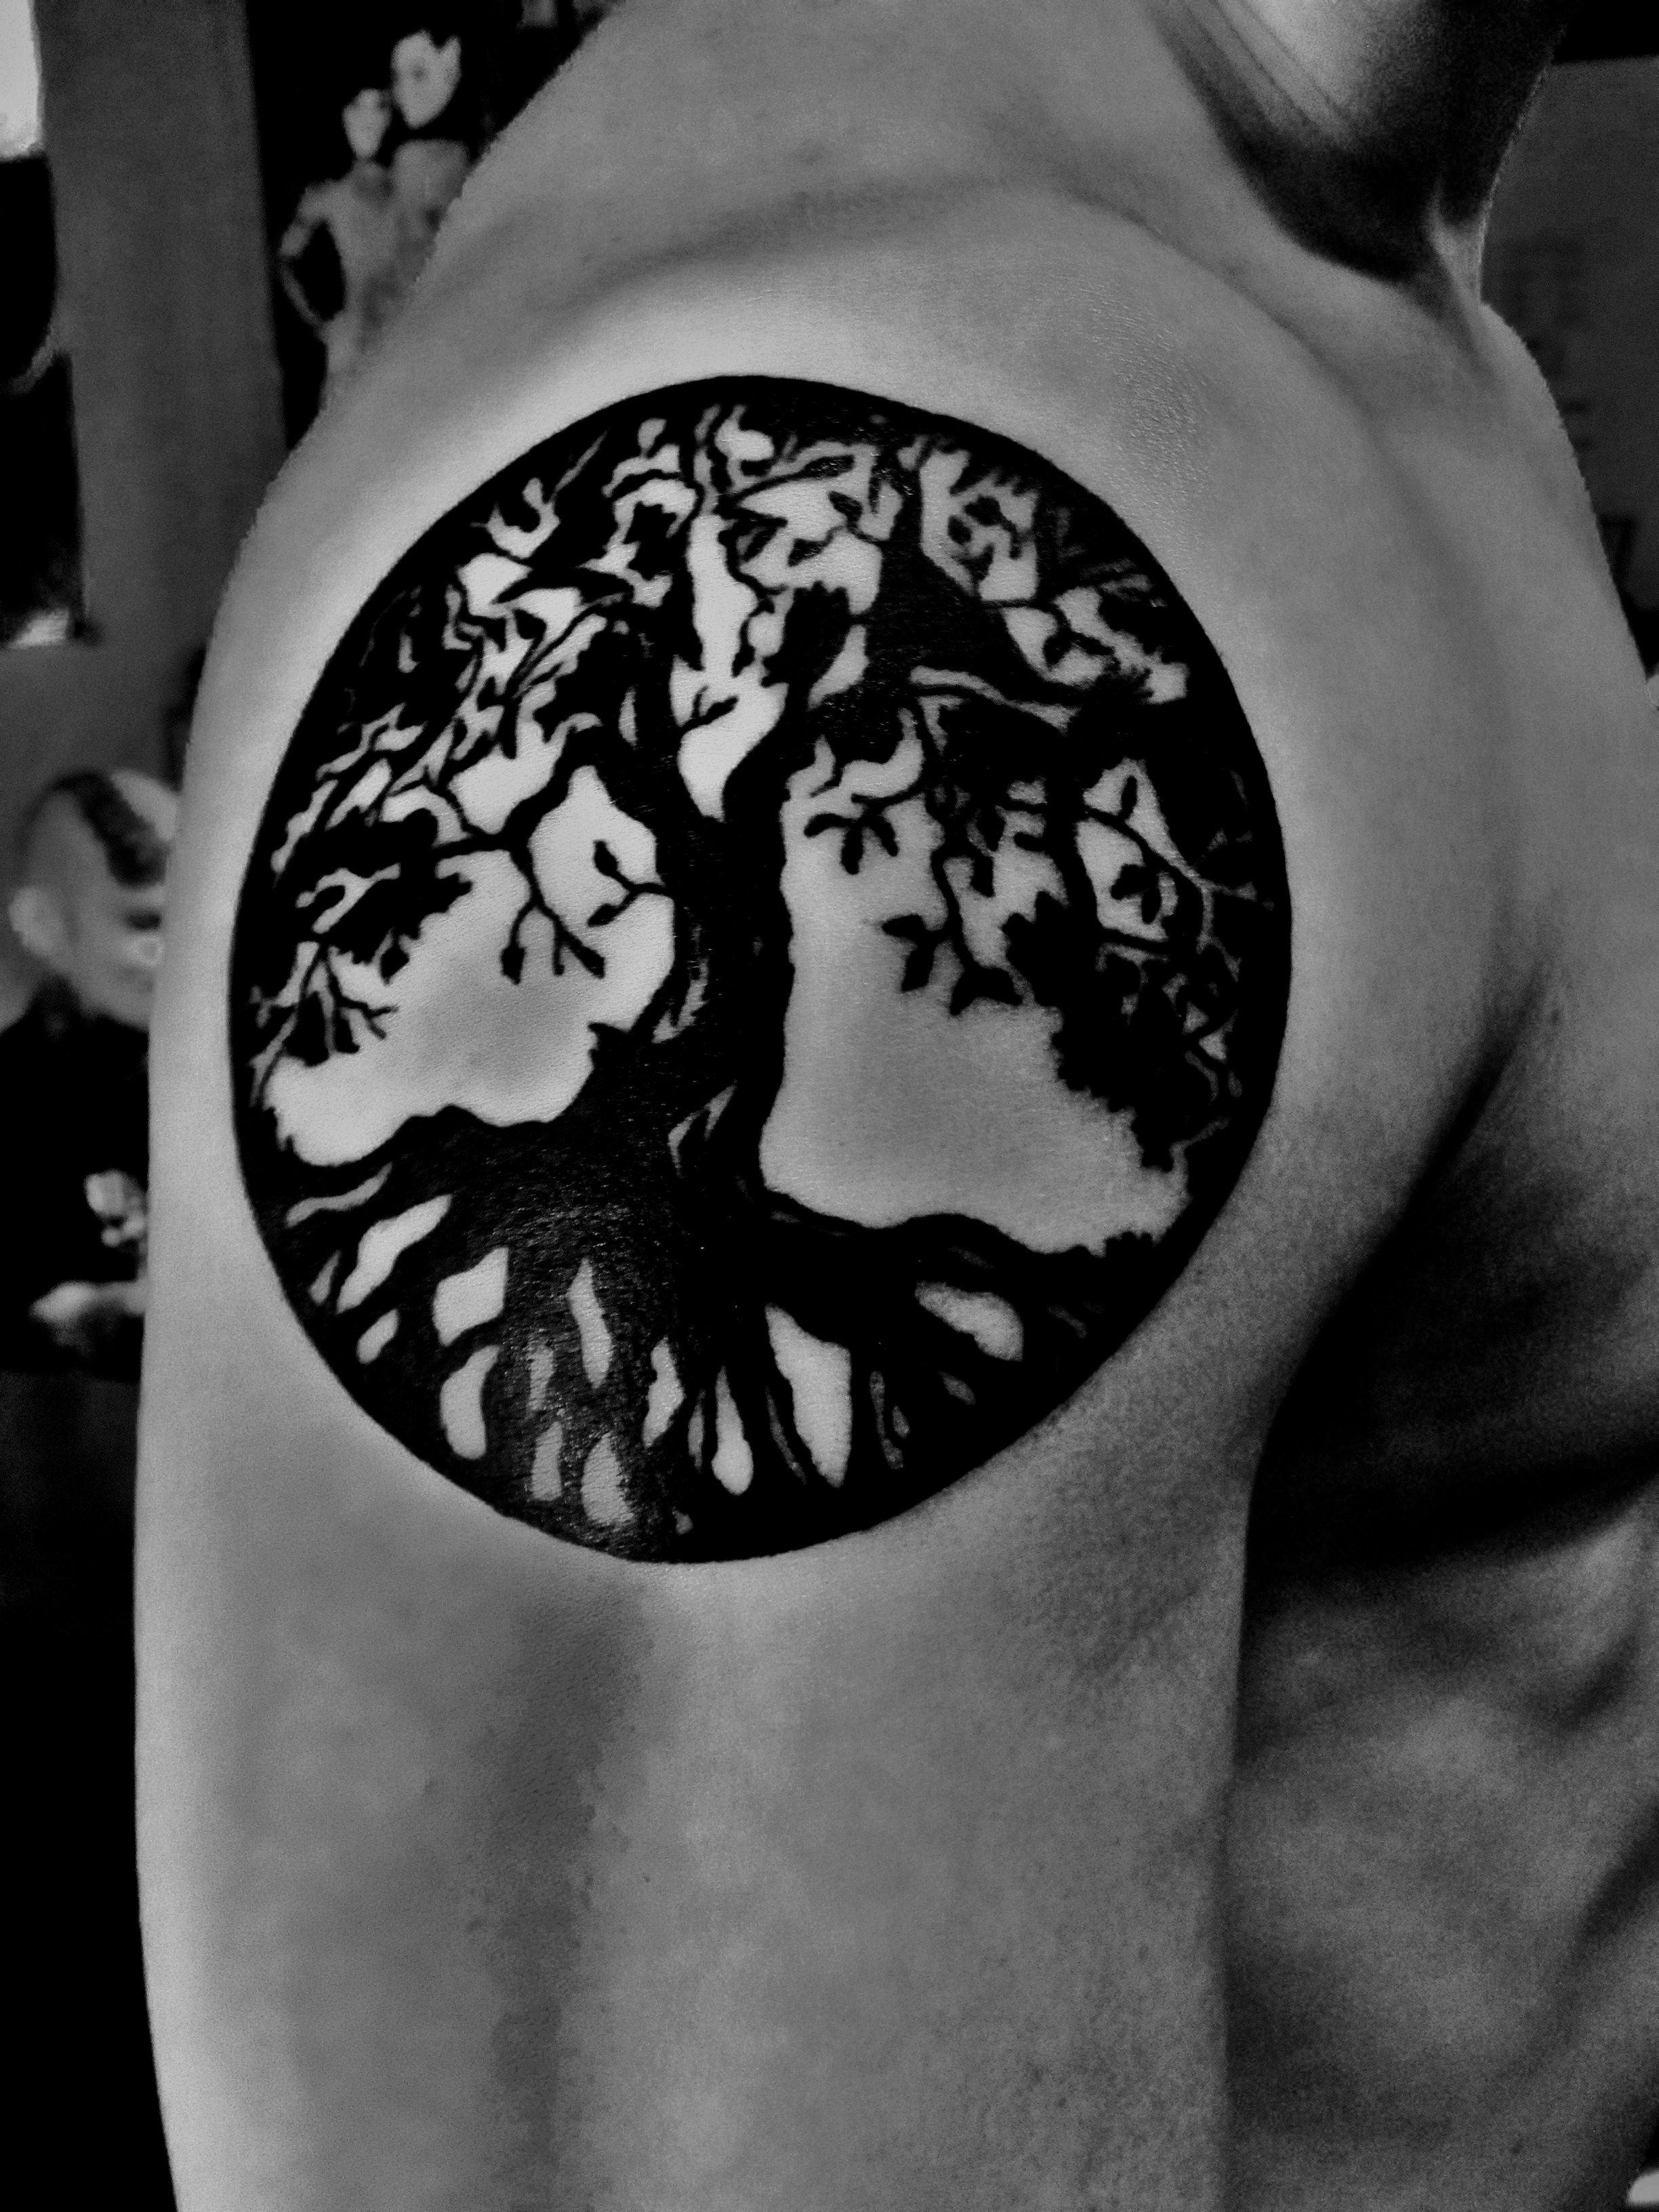 Tree Of Life Tattoo Tattoos Tree Of Life Tattoo Shoulder Tattoo Small Shoulder Tattoos